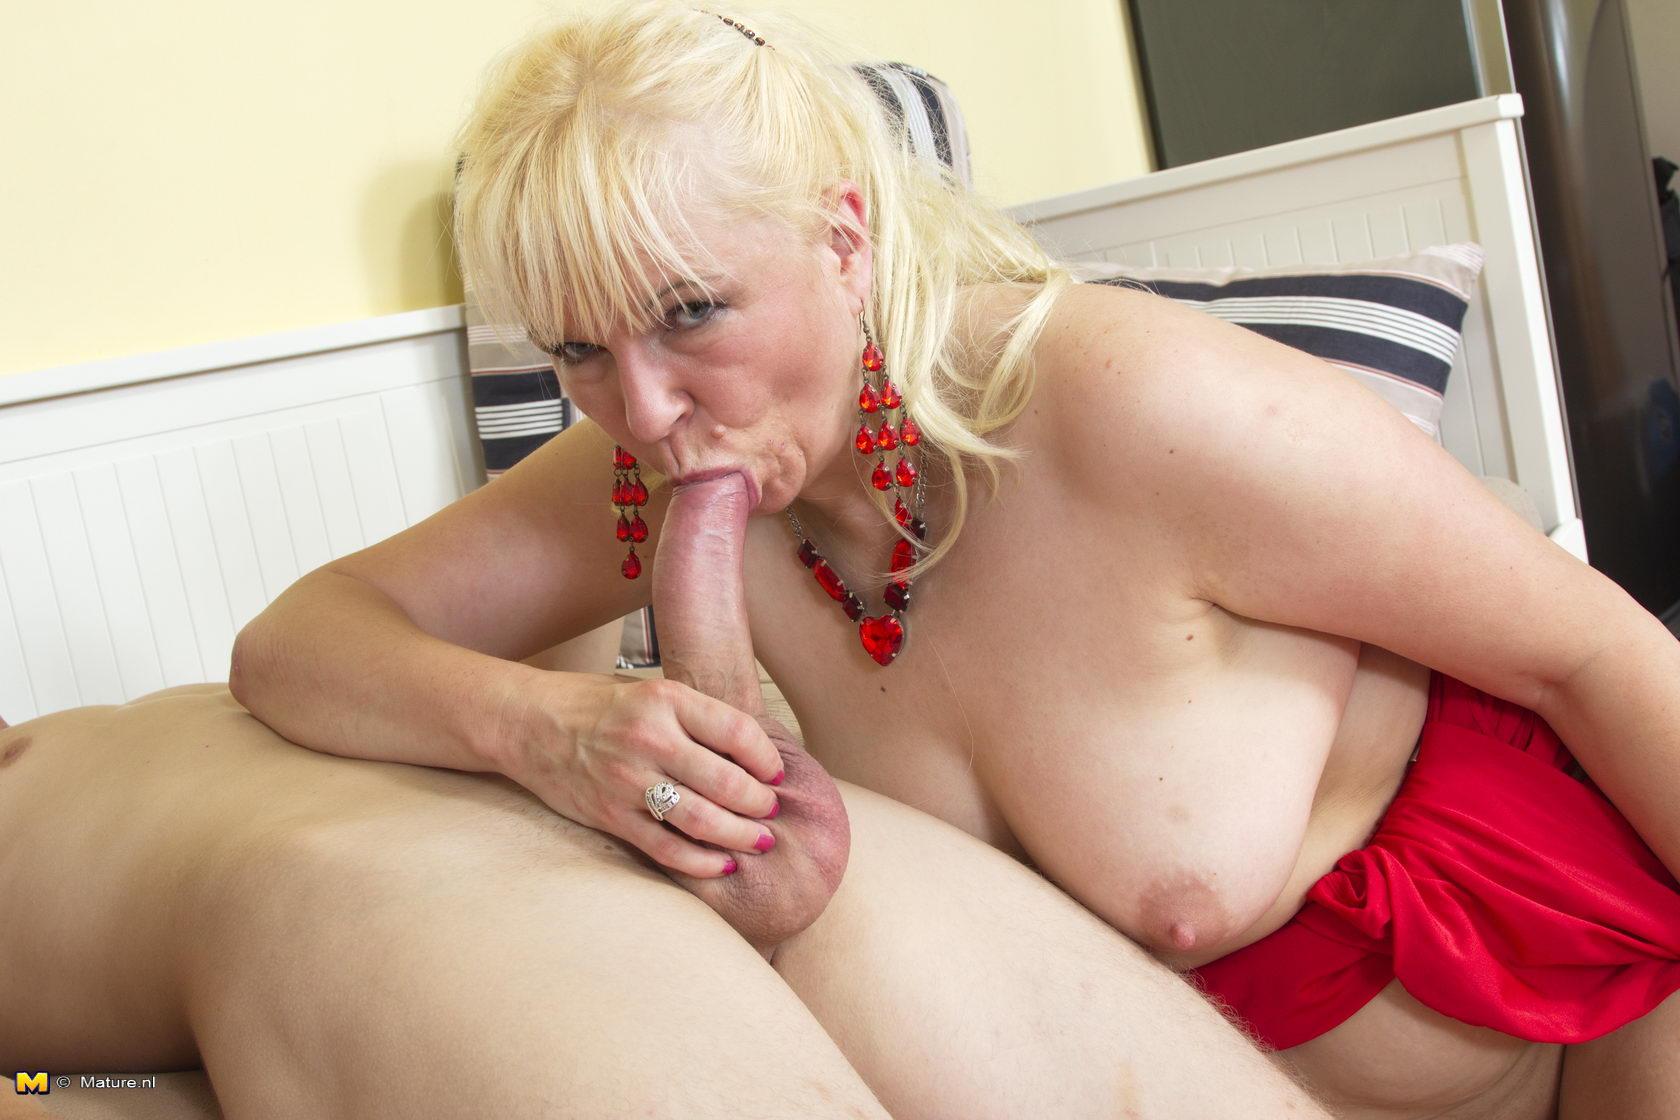 Lesbian milf seduction stories